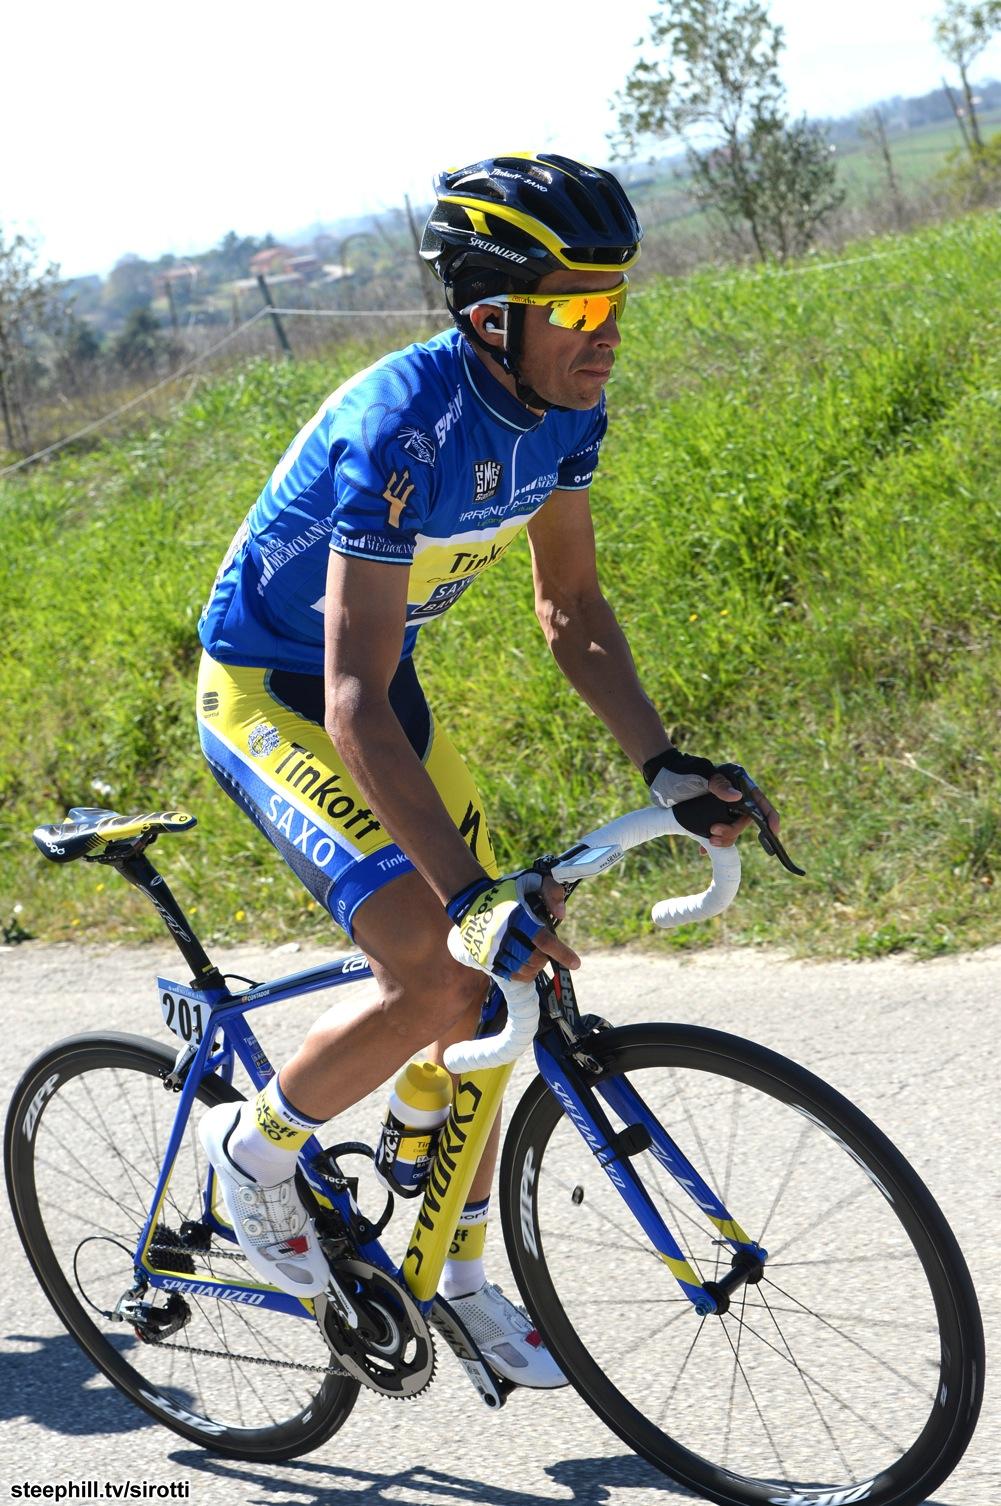 Photos Alberto Contador - Page 6 192-PIC443736250